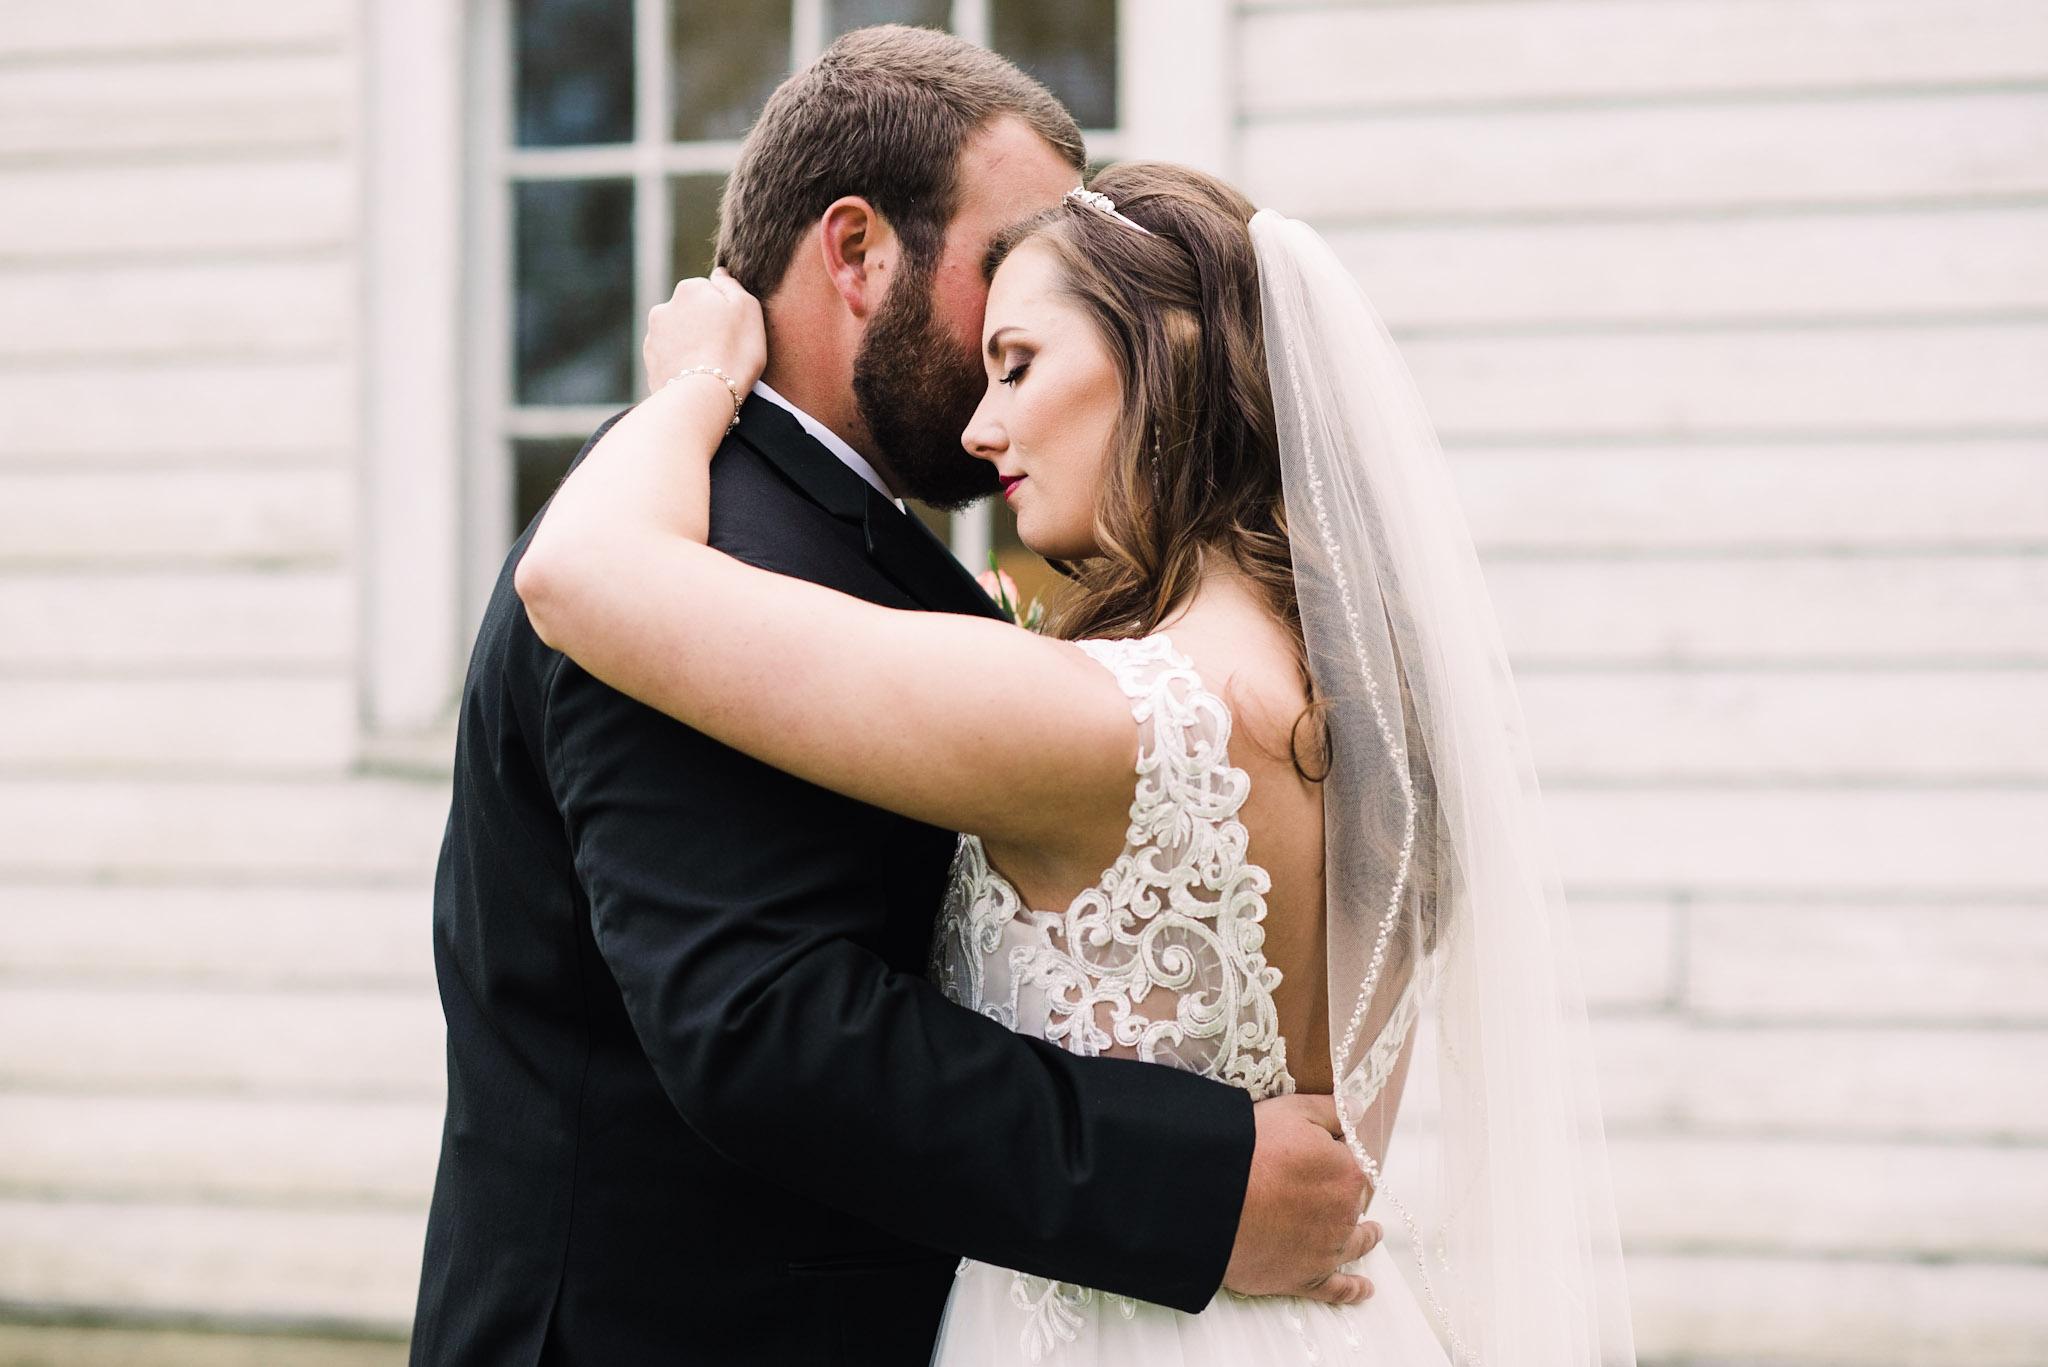 Jas_Natalie_Foxworth_Wedding_2018-10.jpg